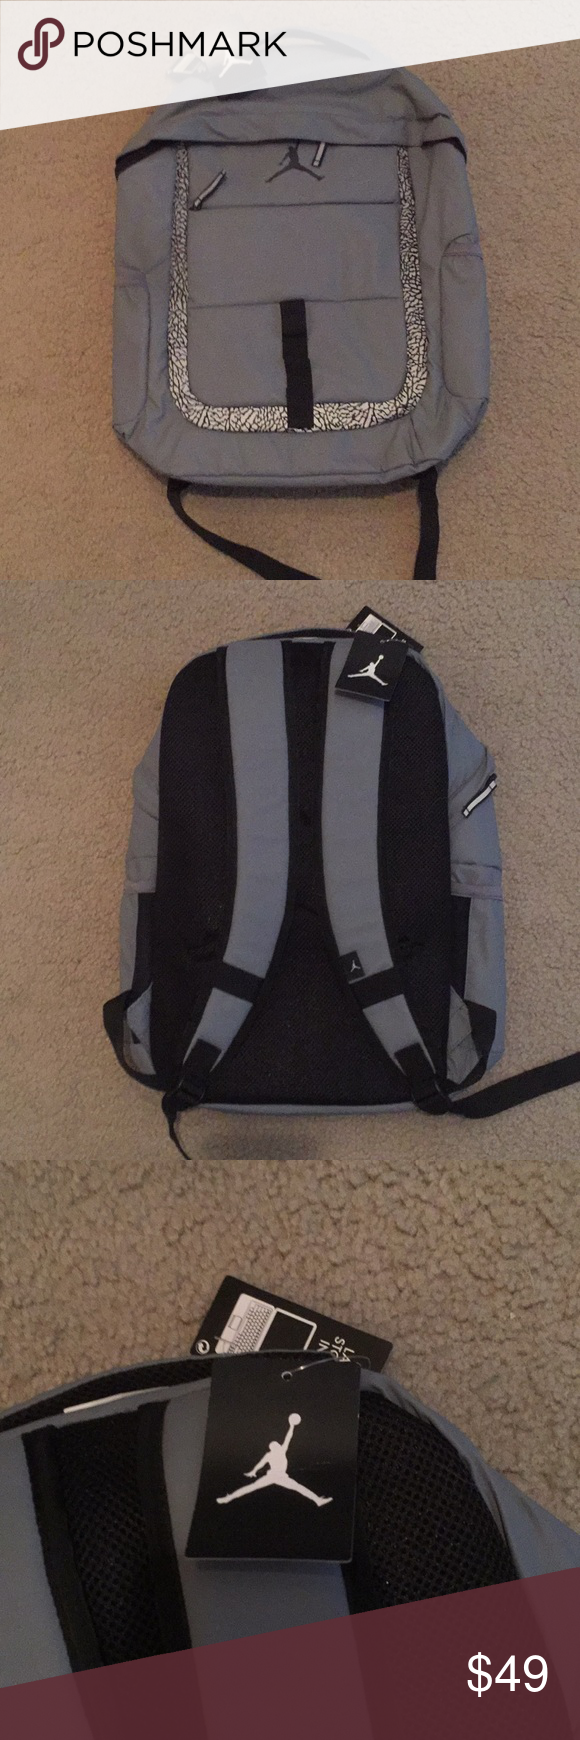 6401cd4e983e68 NEW Jordan Brand Backpack Brand new Jordan Brand Backpack with the tags  still attached! Jordan Bags Backpacks